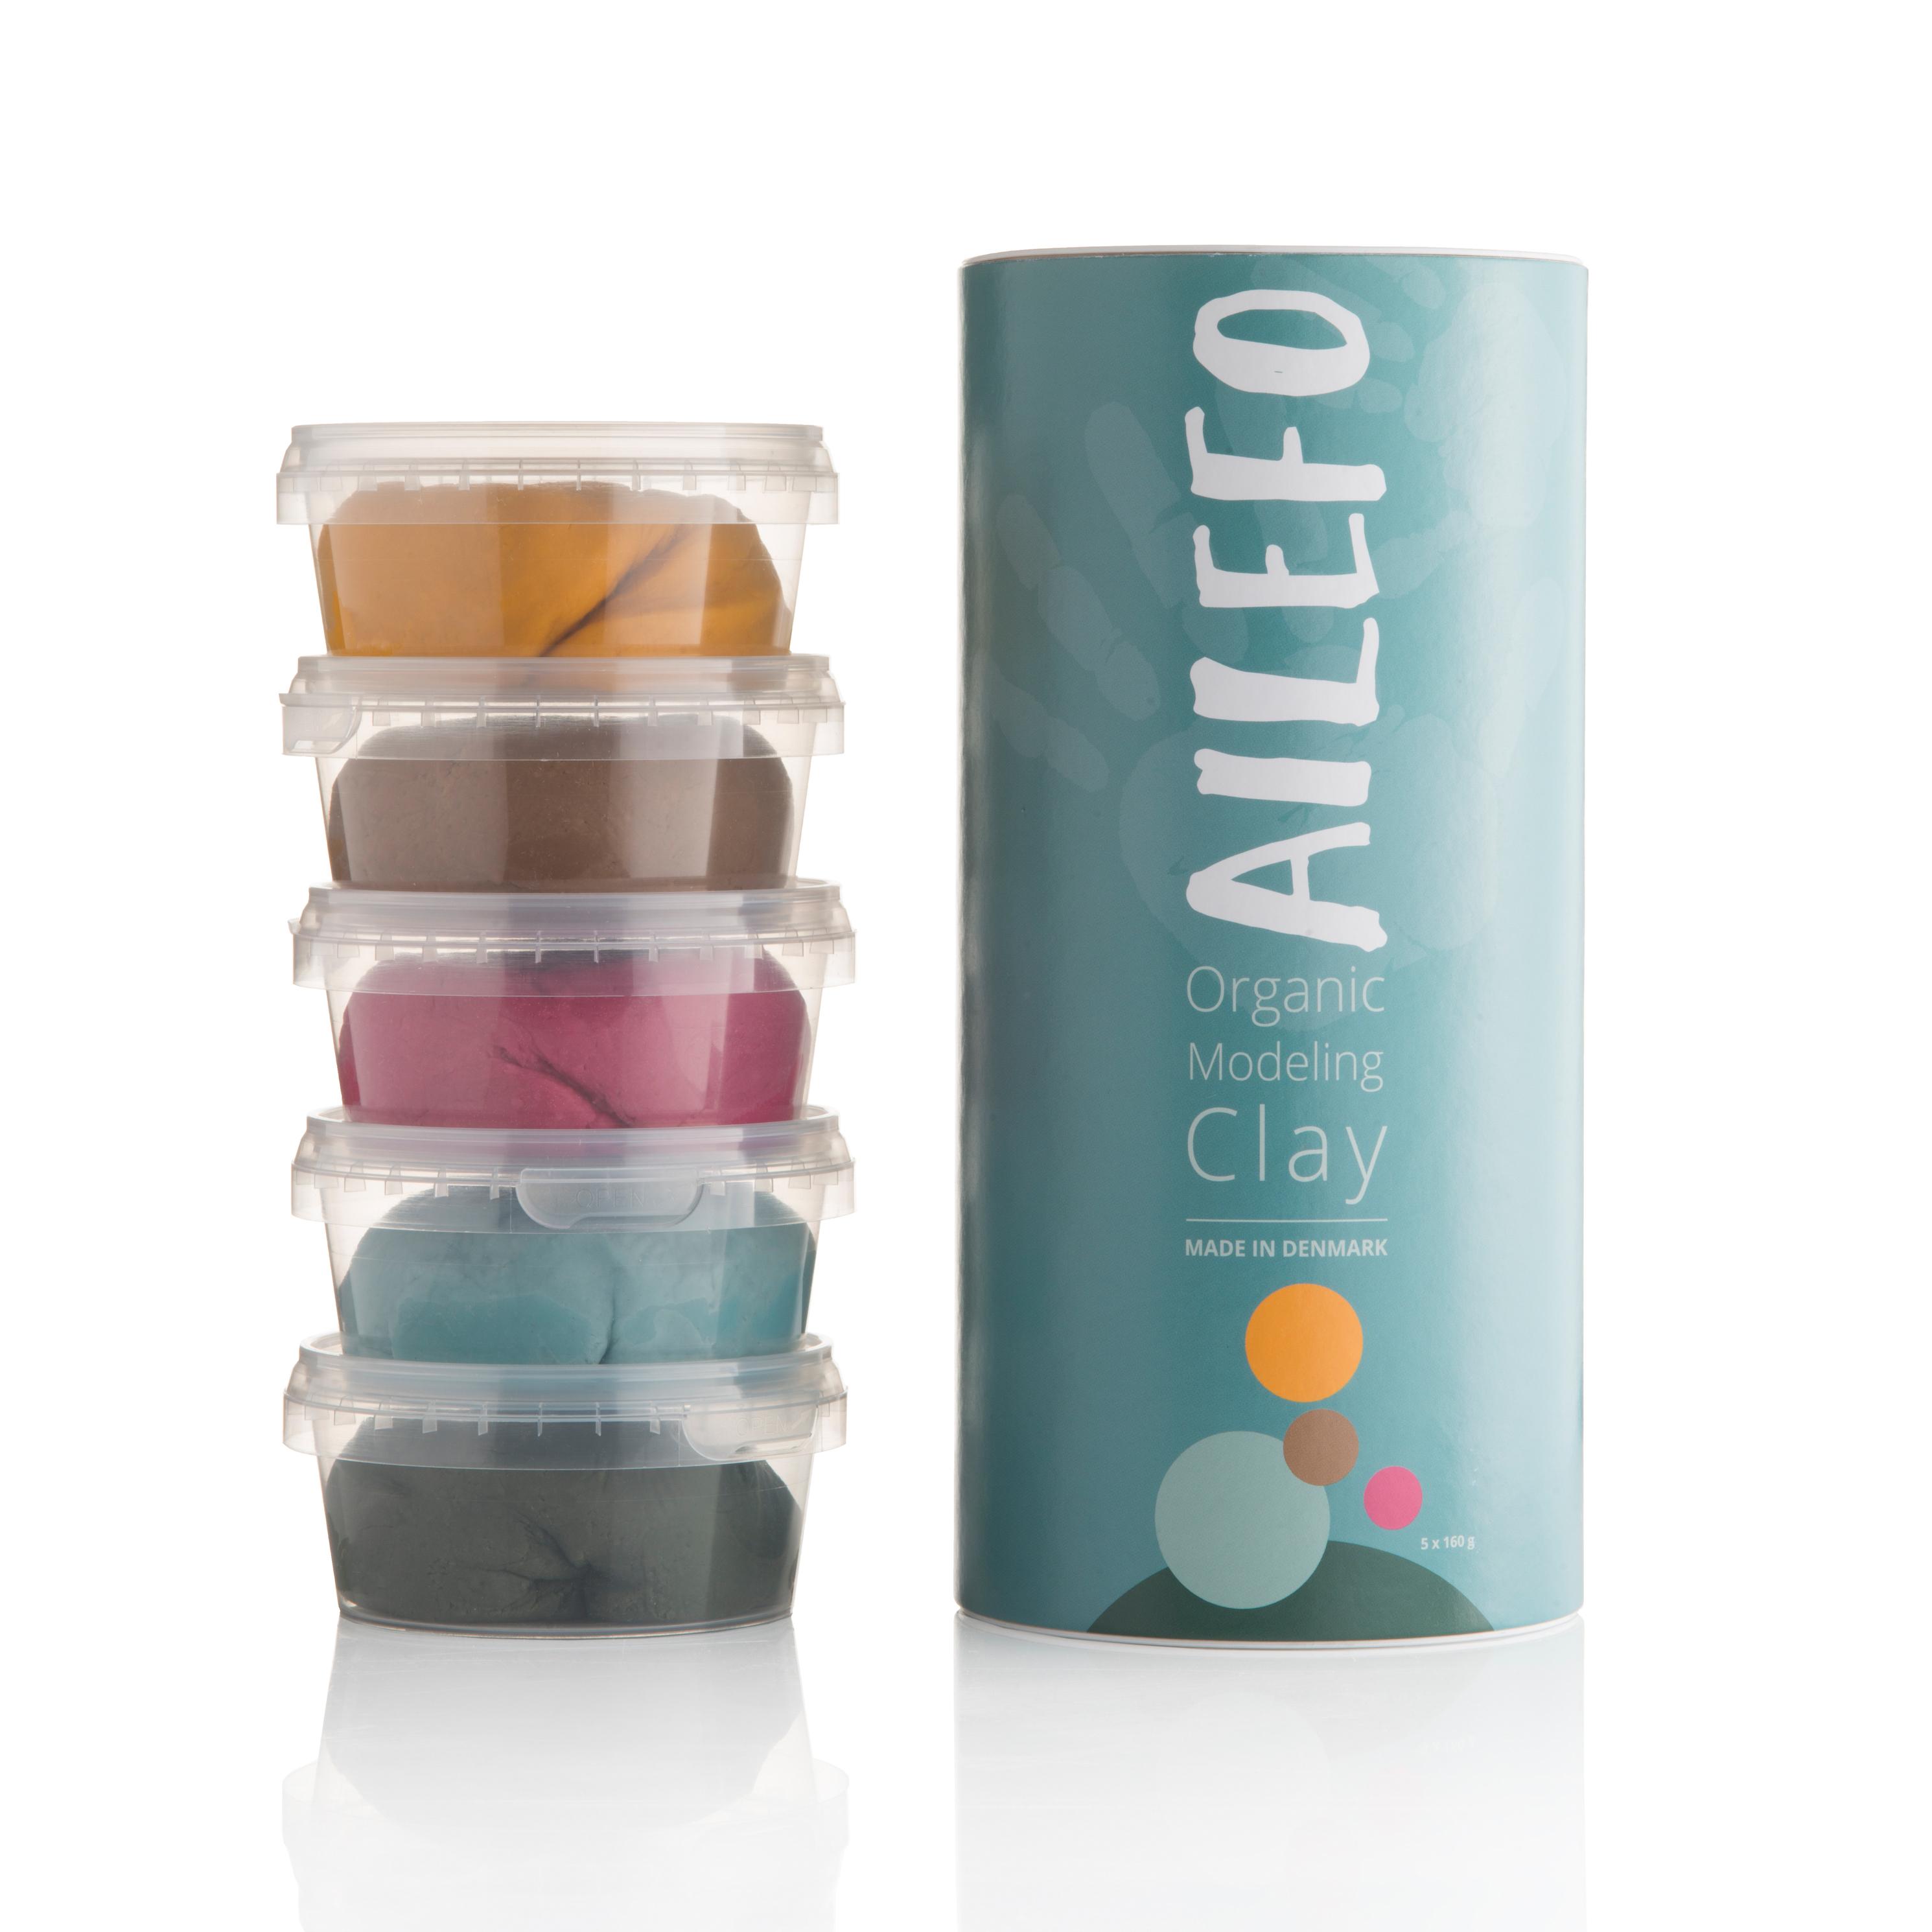 Ailefo - Bio Knete 5er Set groß